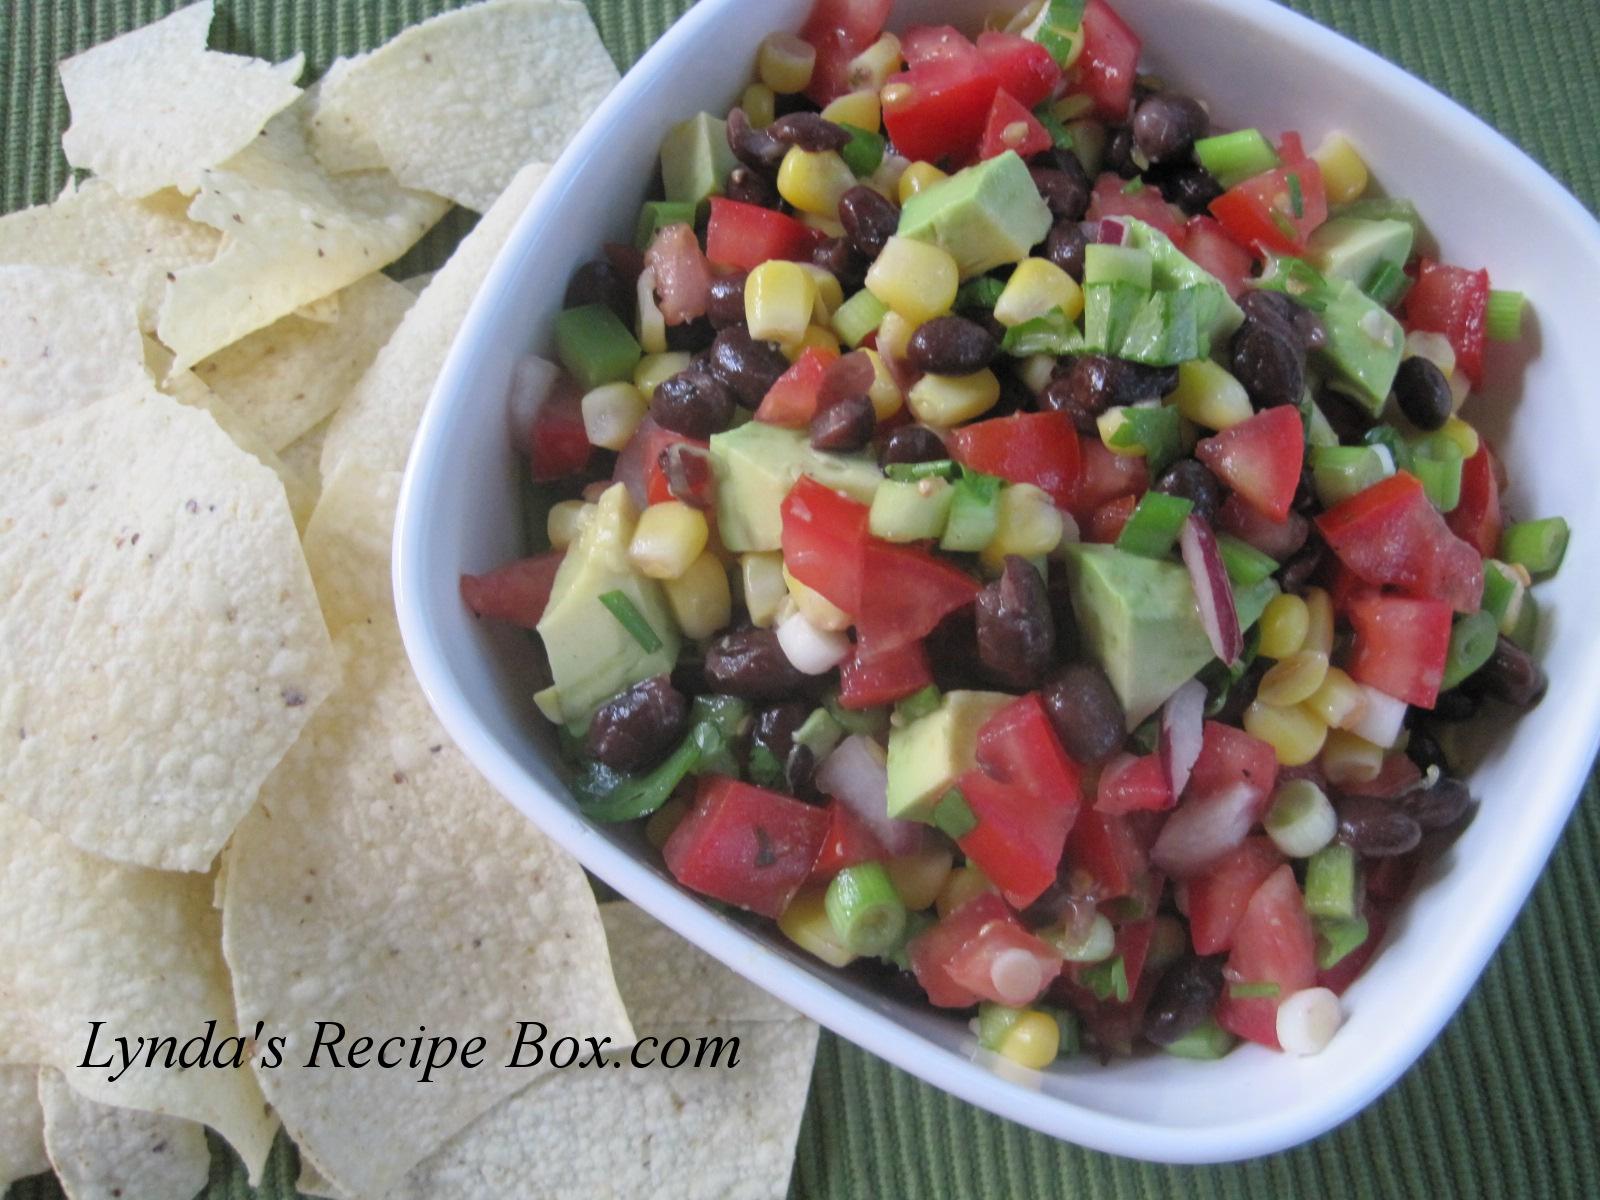 Lynda S Recipe Box Memorial Day Food Ideas